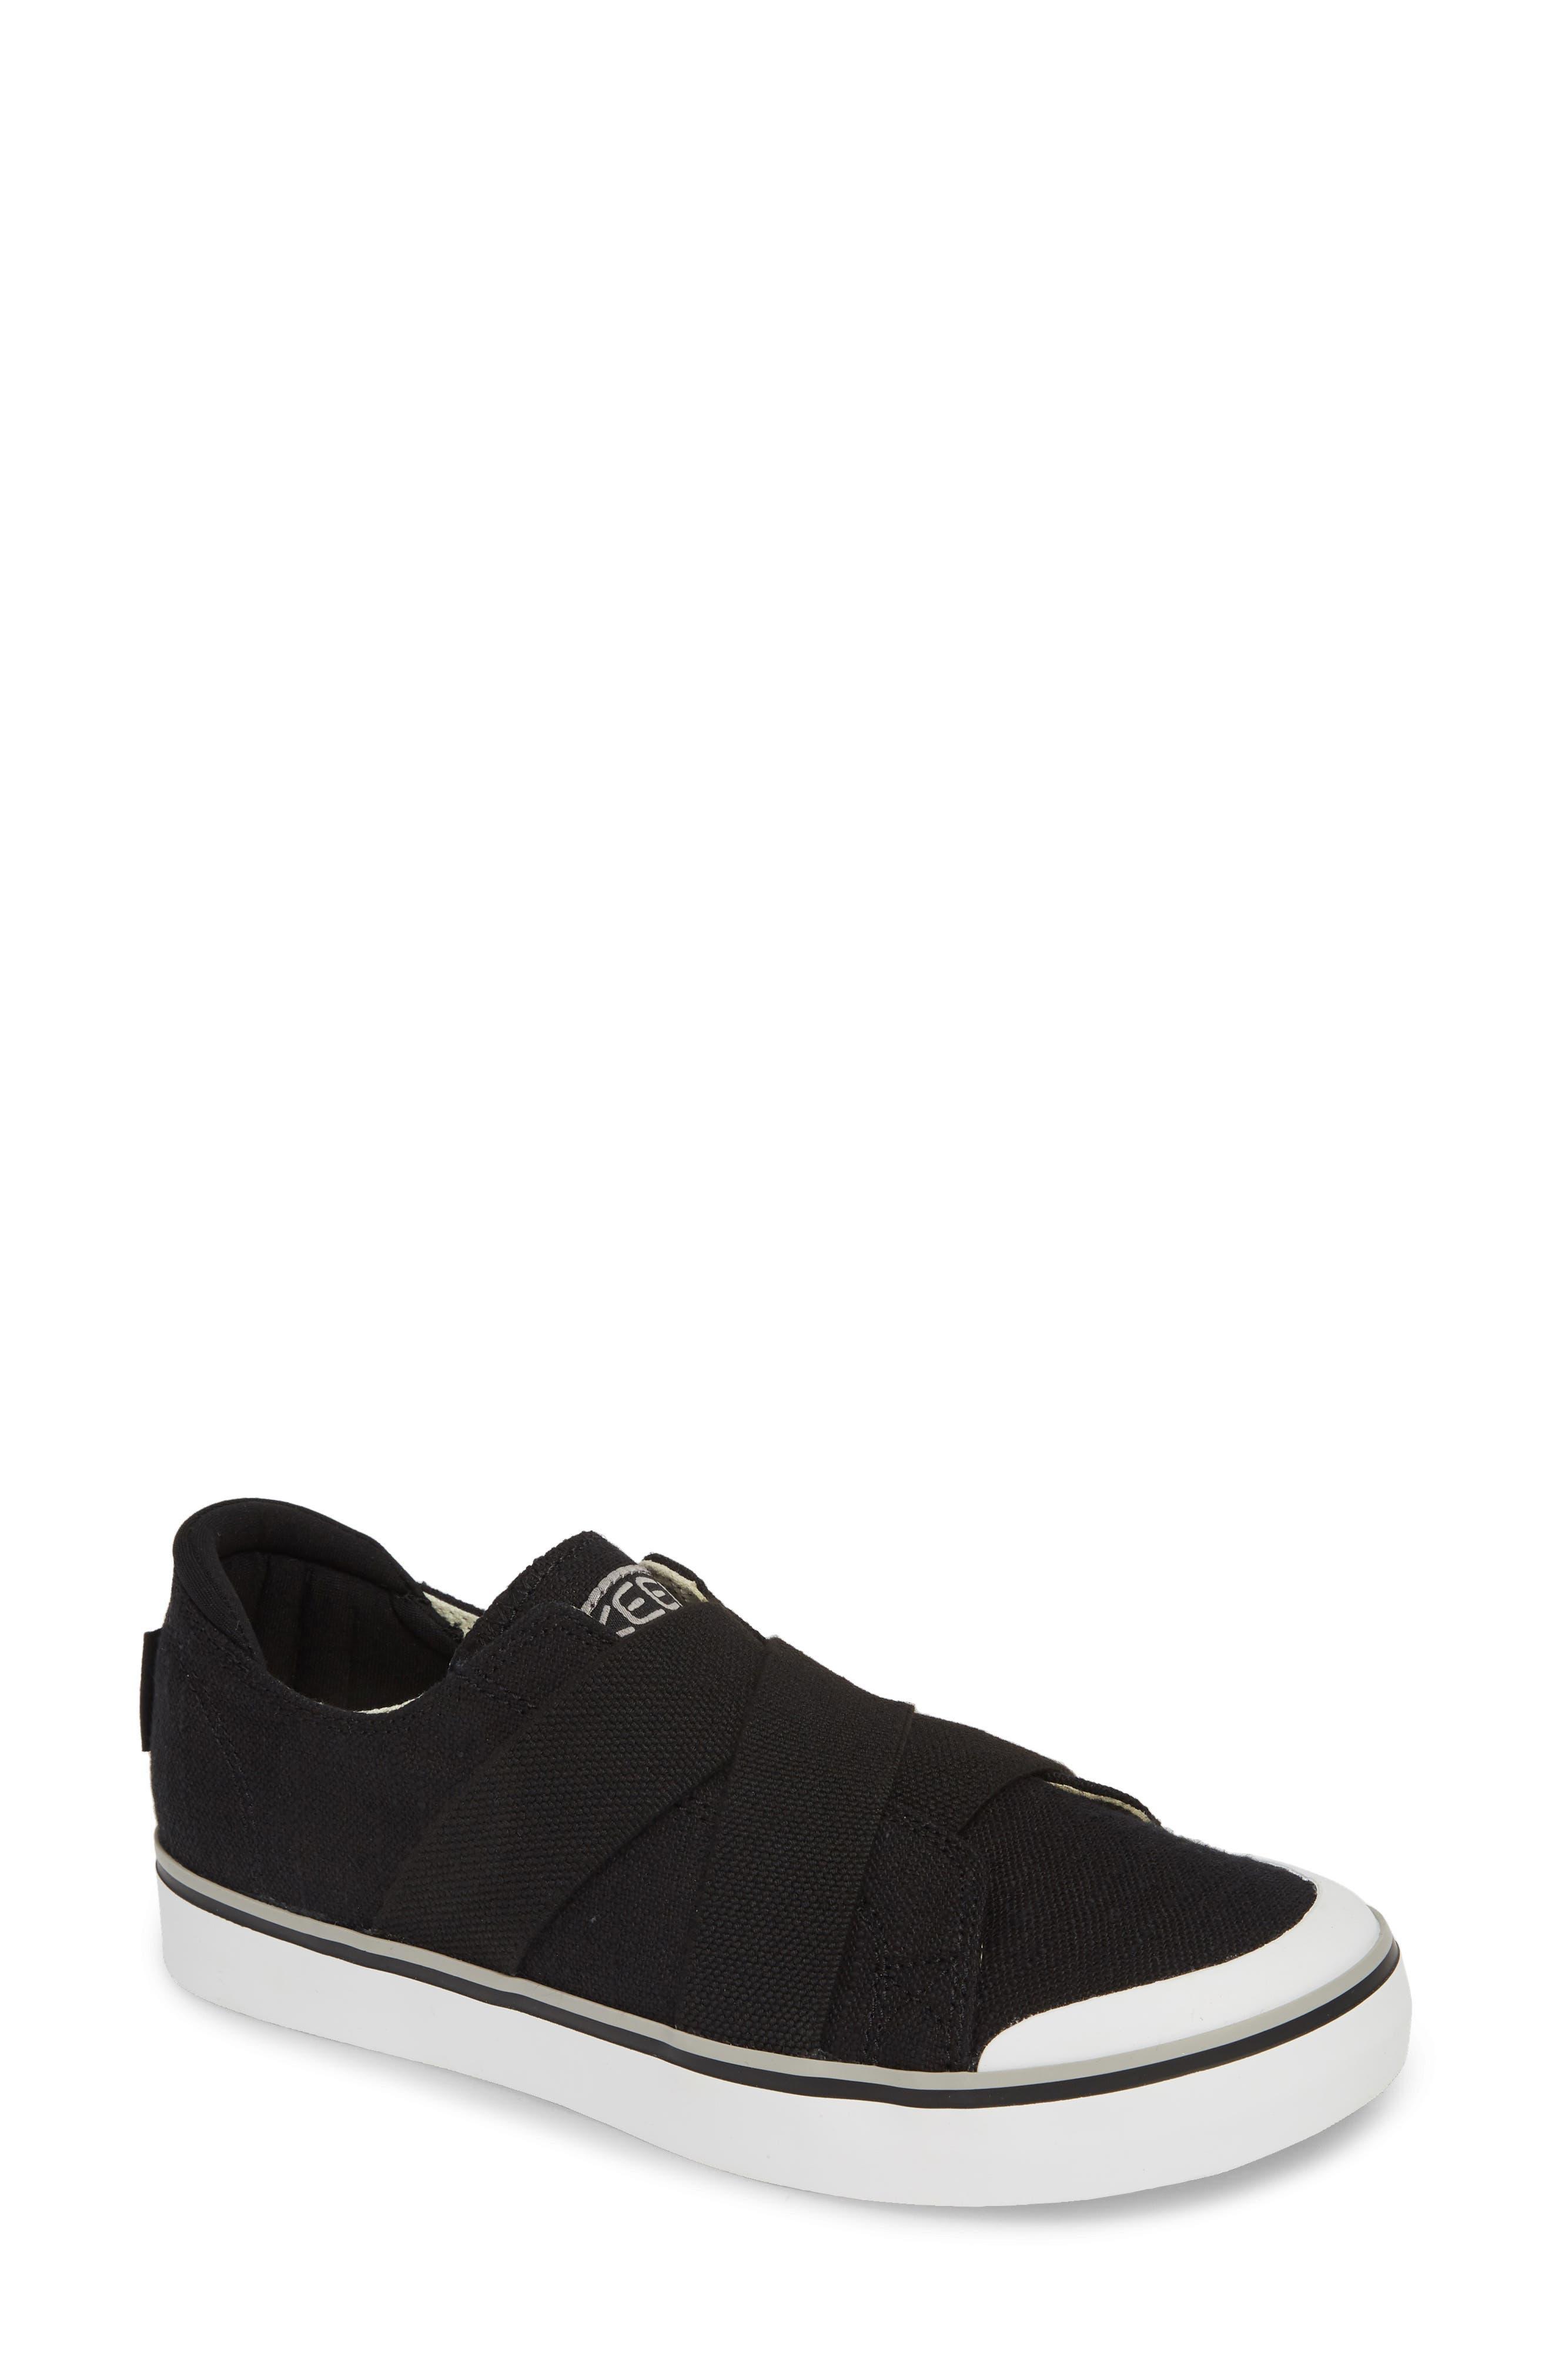 Keen Elsa Iii Slip-On Sneaker, Black